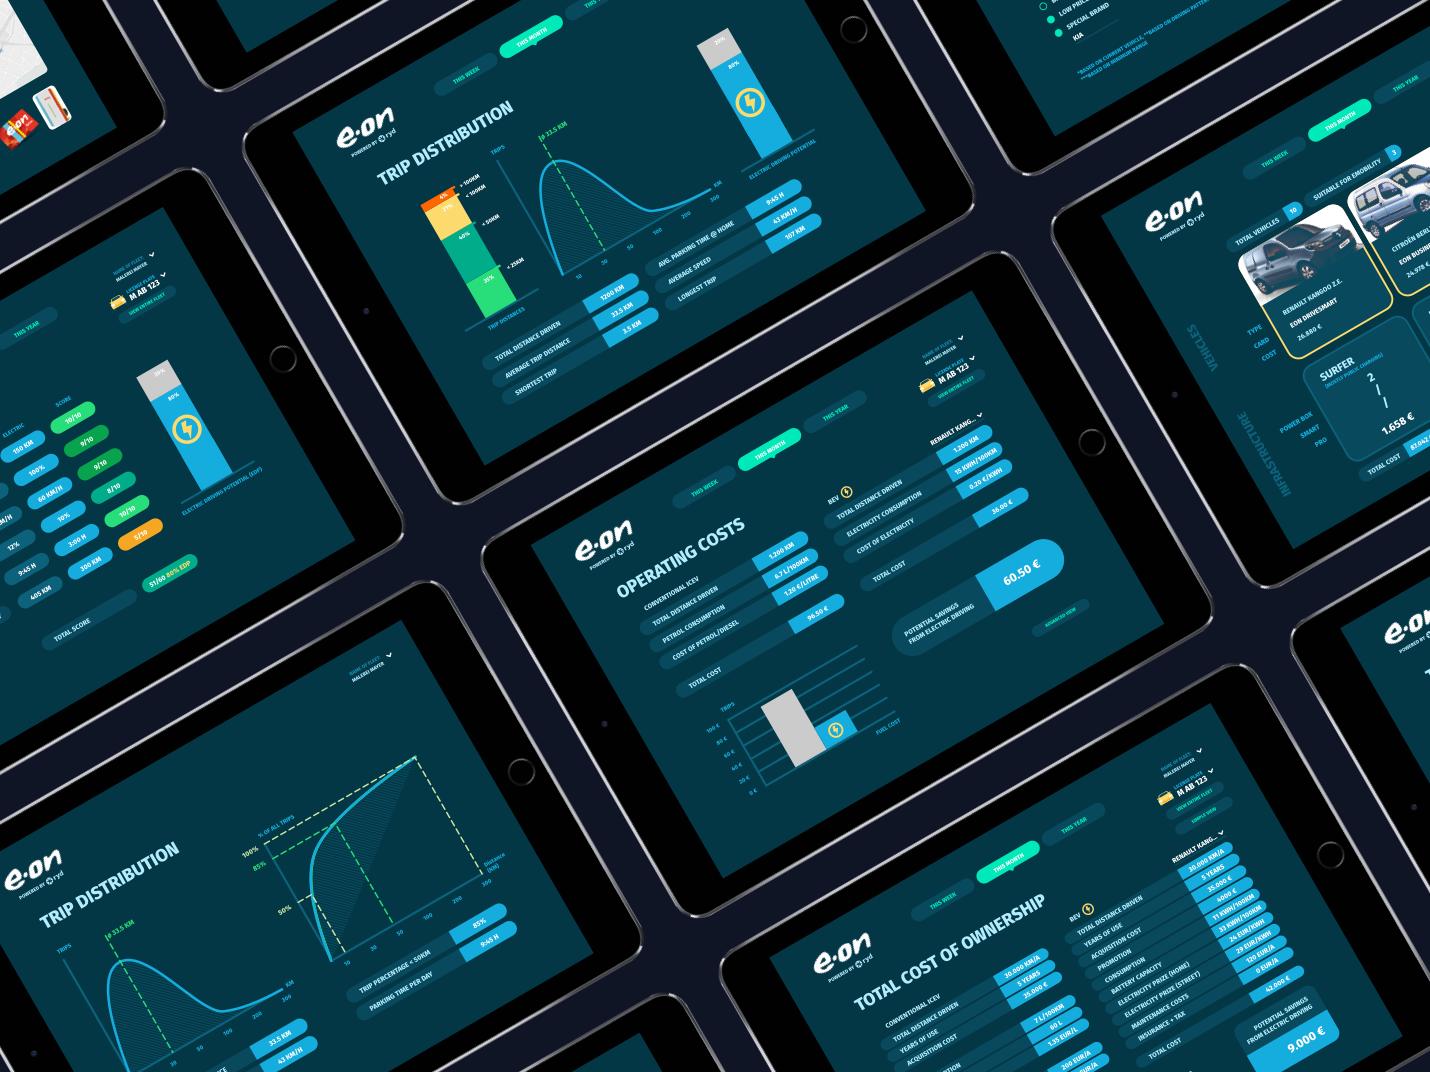 ryd+eon mobile responsive design webdesign ui ux design